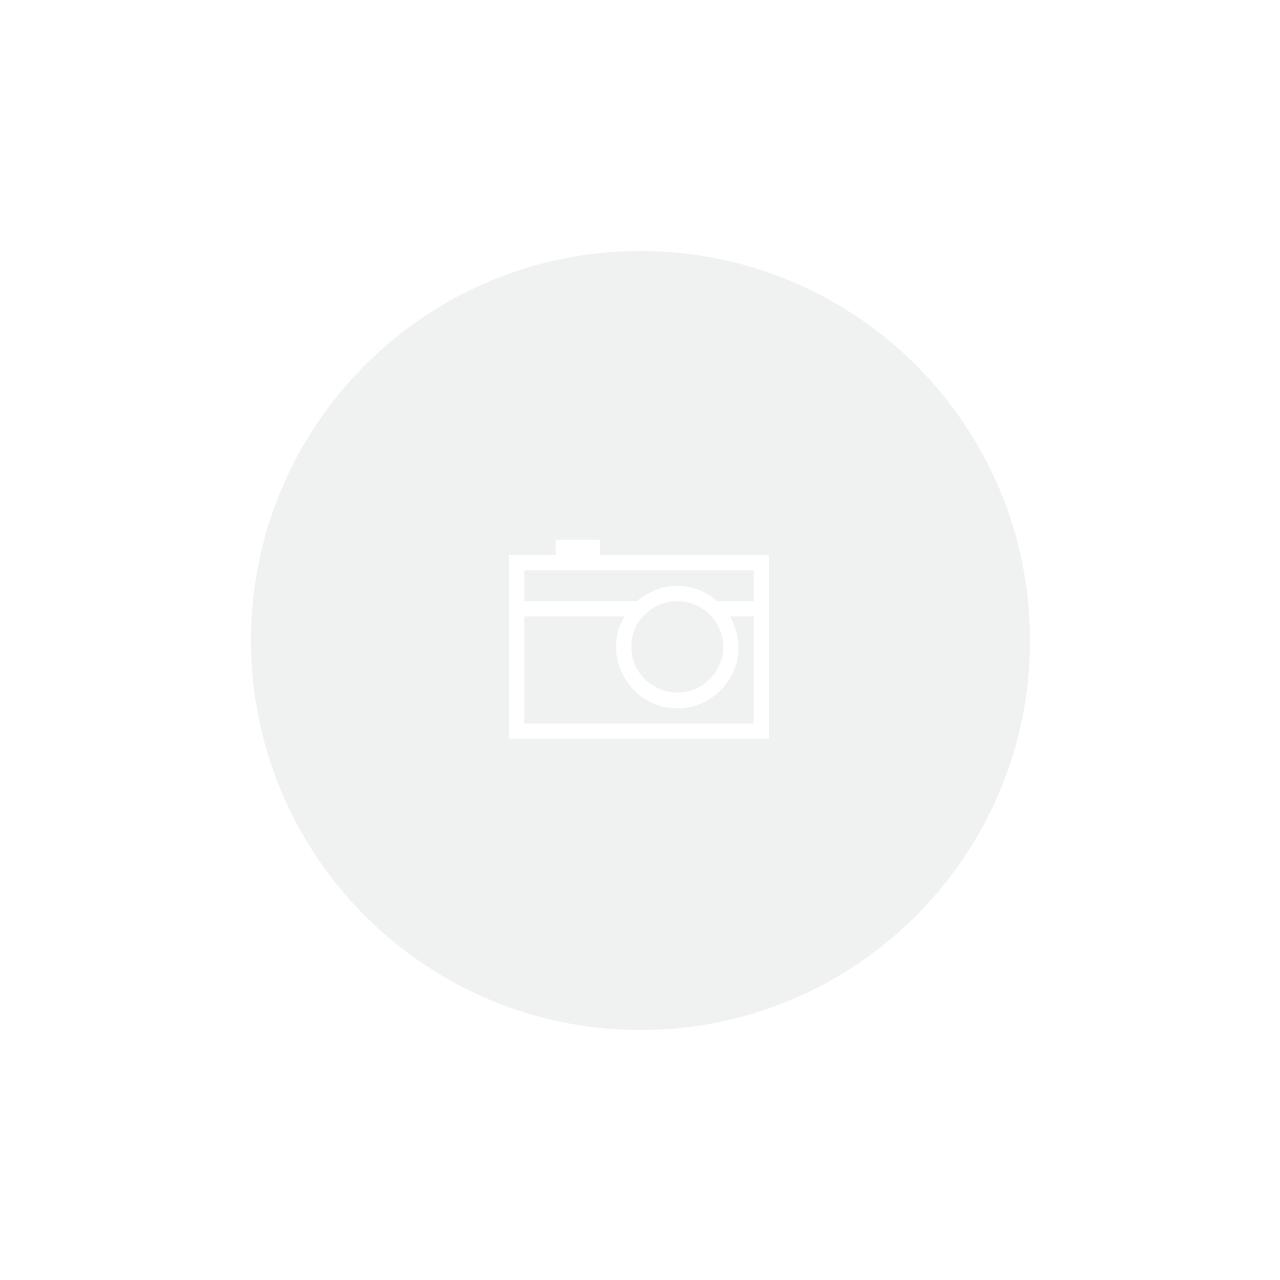 Papel Artesanal Indiano - Ref. 77